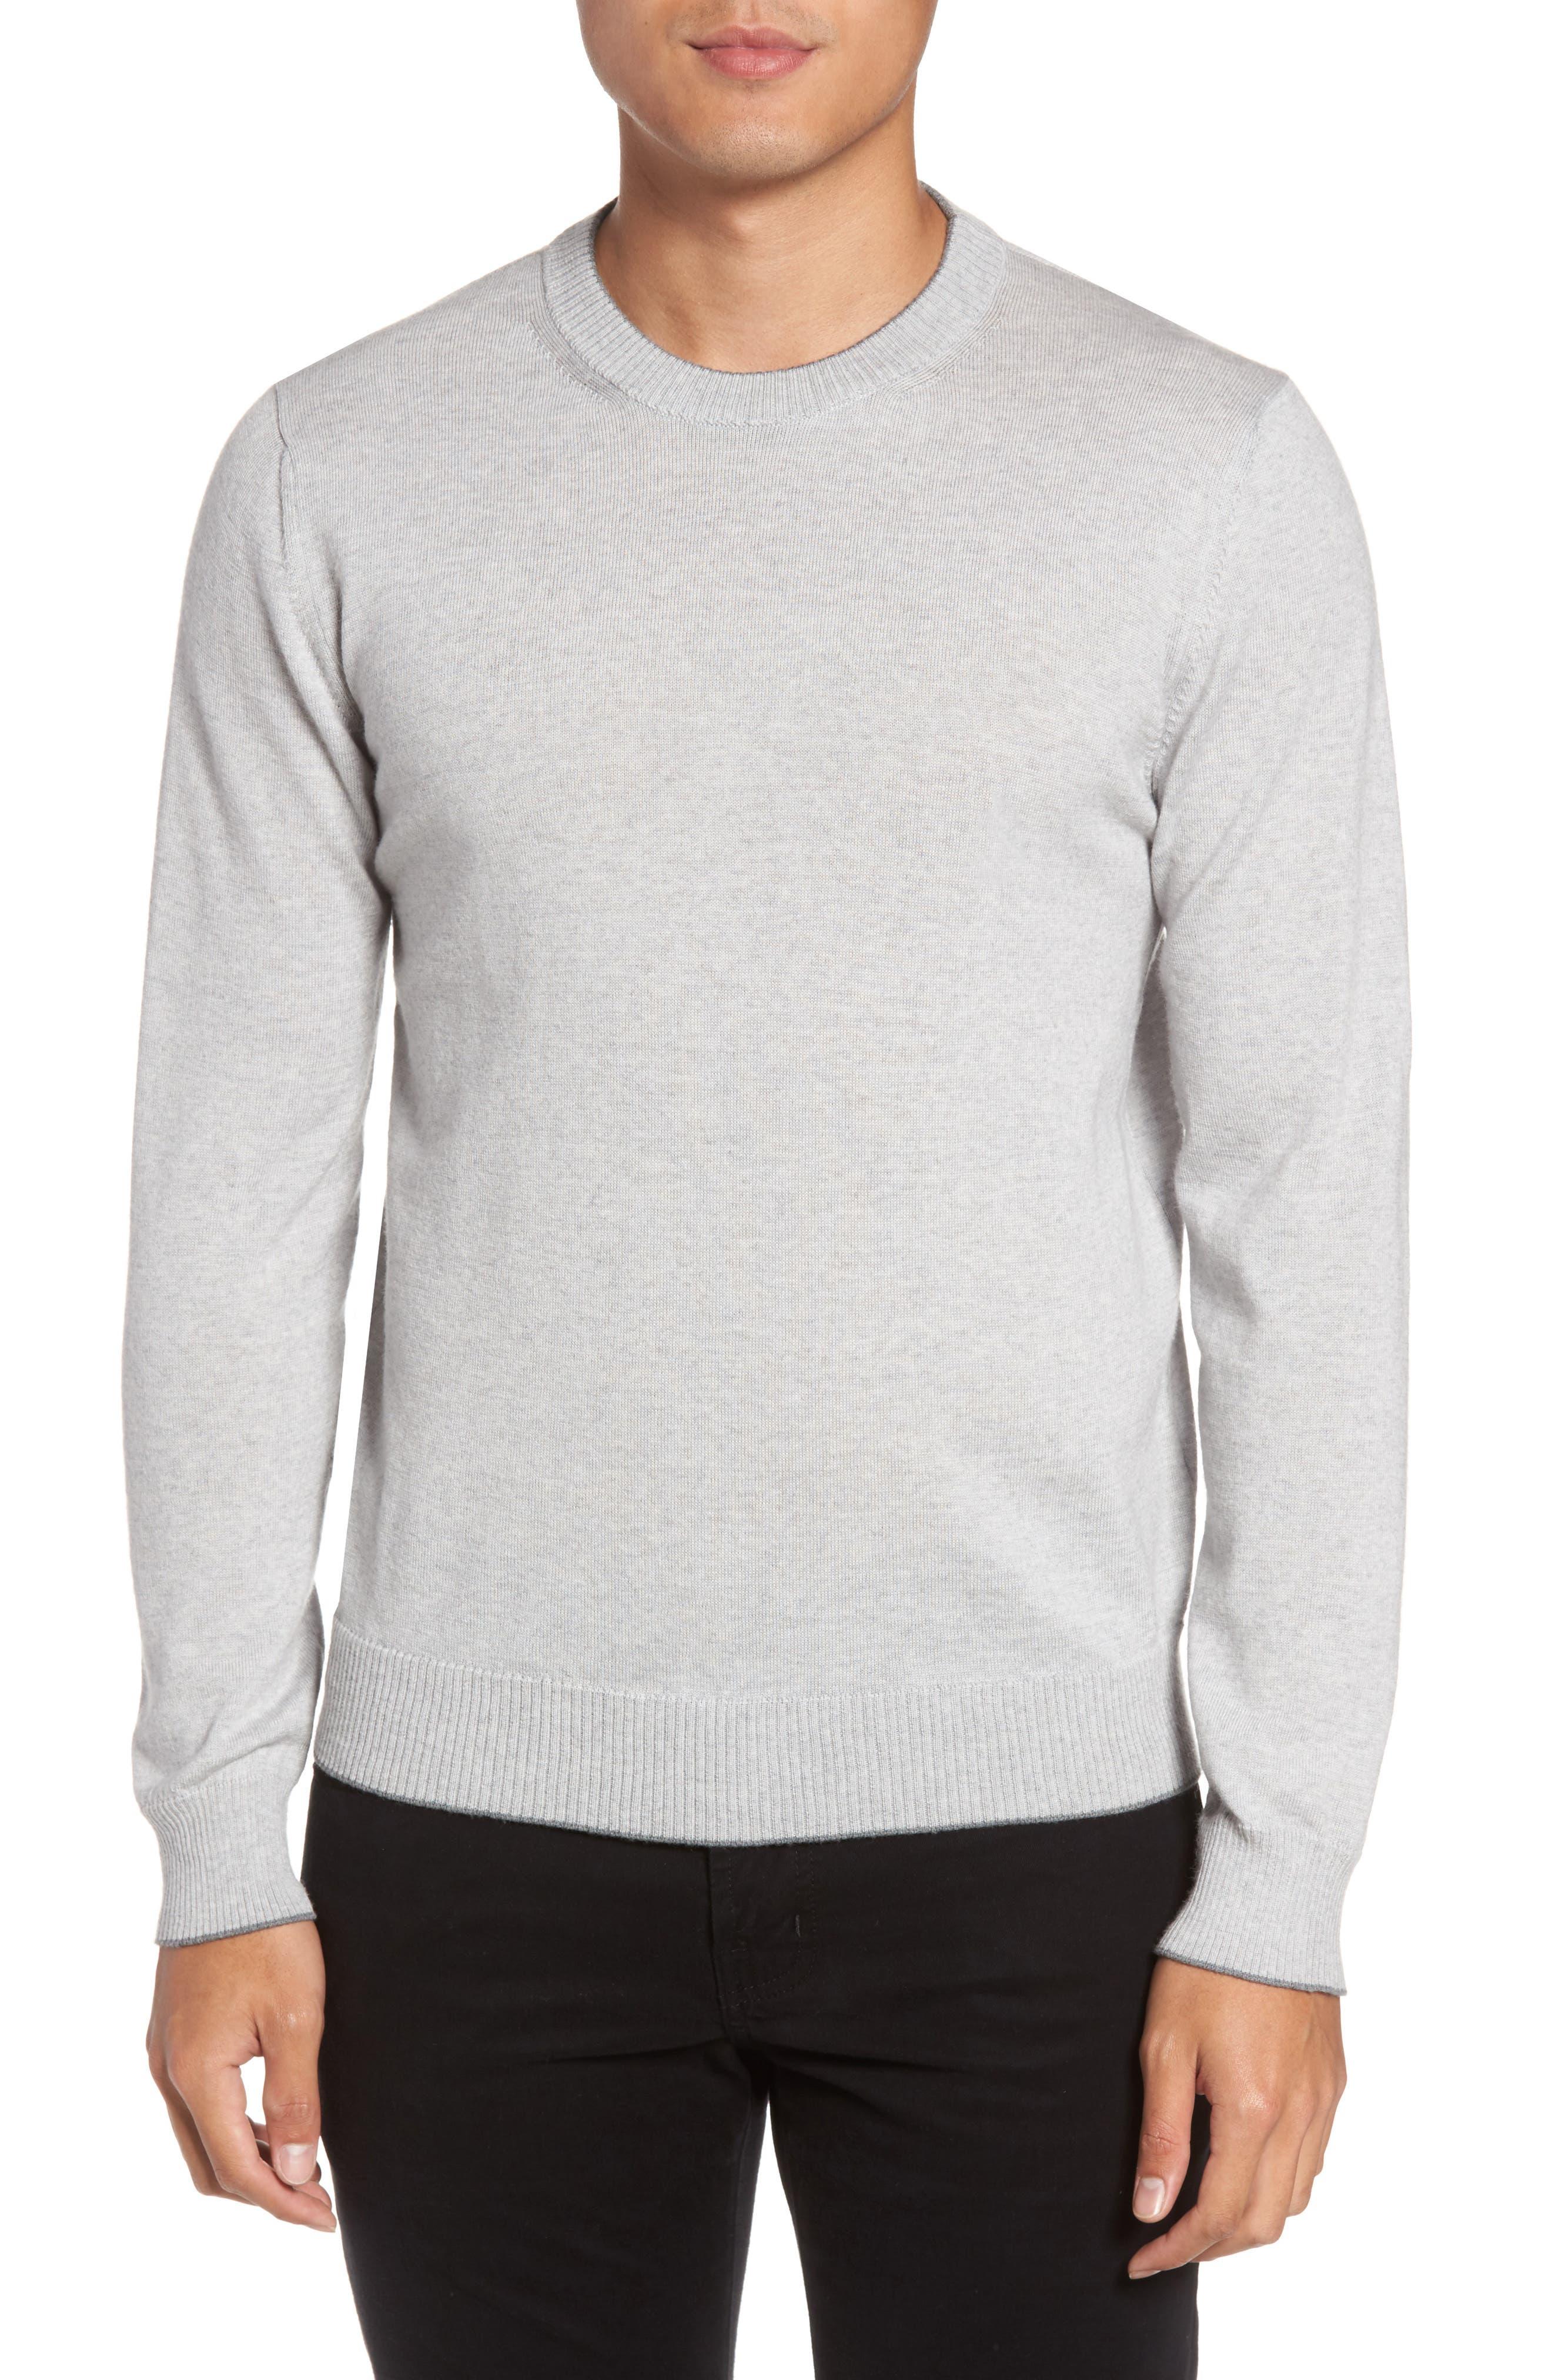 Virgin Wool Crewneck Sweater,                             Main thumbnail 1, color,                             Light Grey